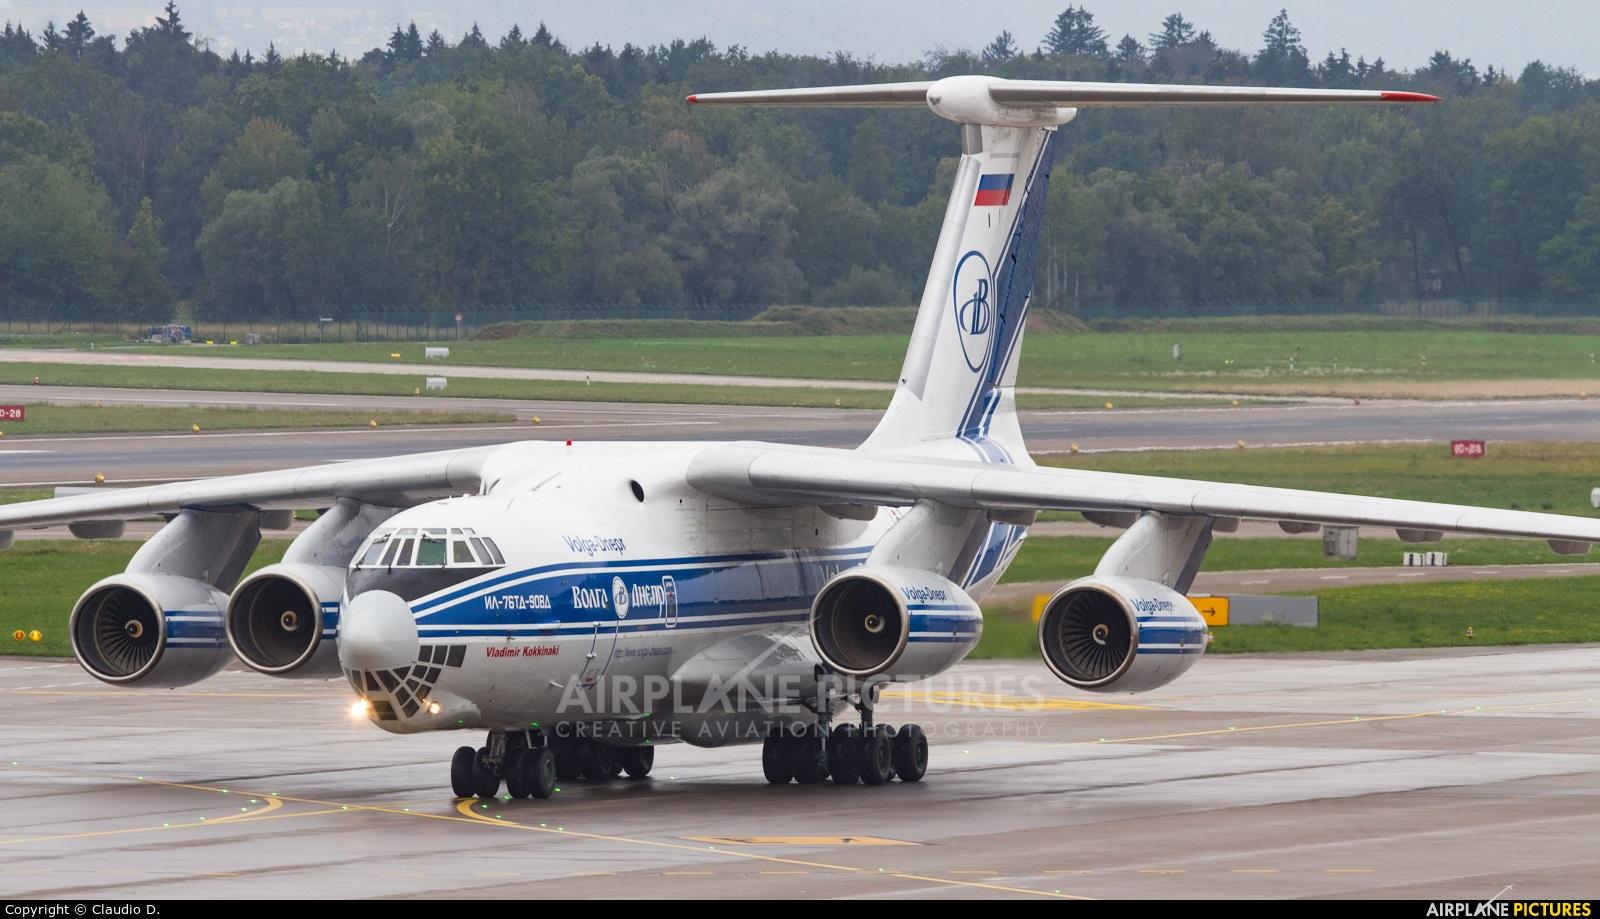 Volga Dnepr Airlines RA-76950 aircraft at Zurich